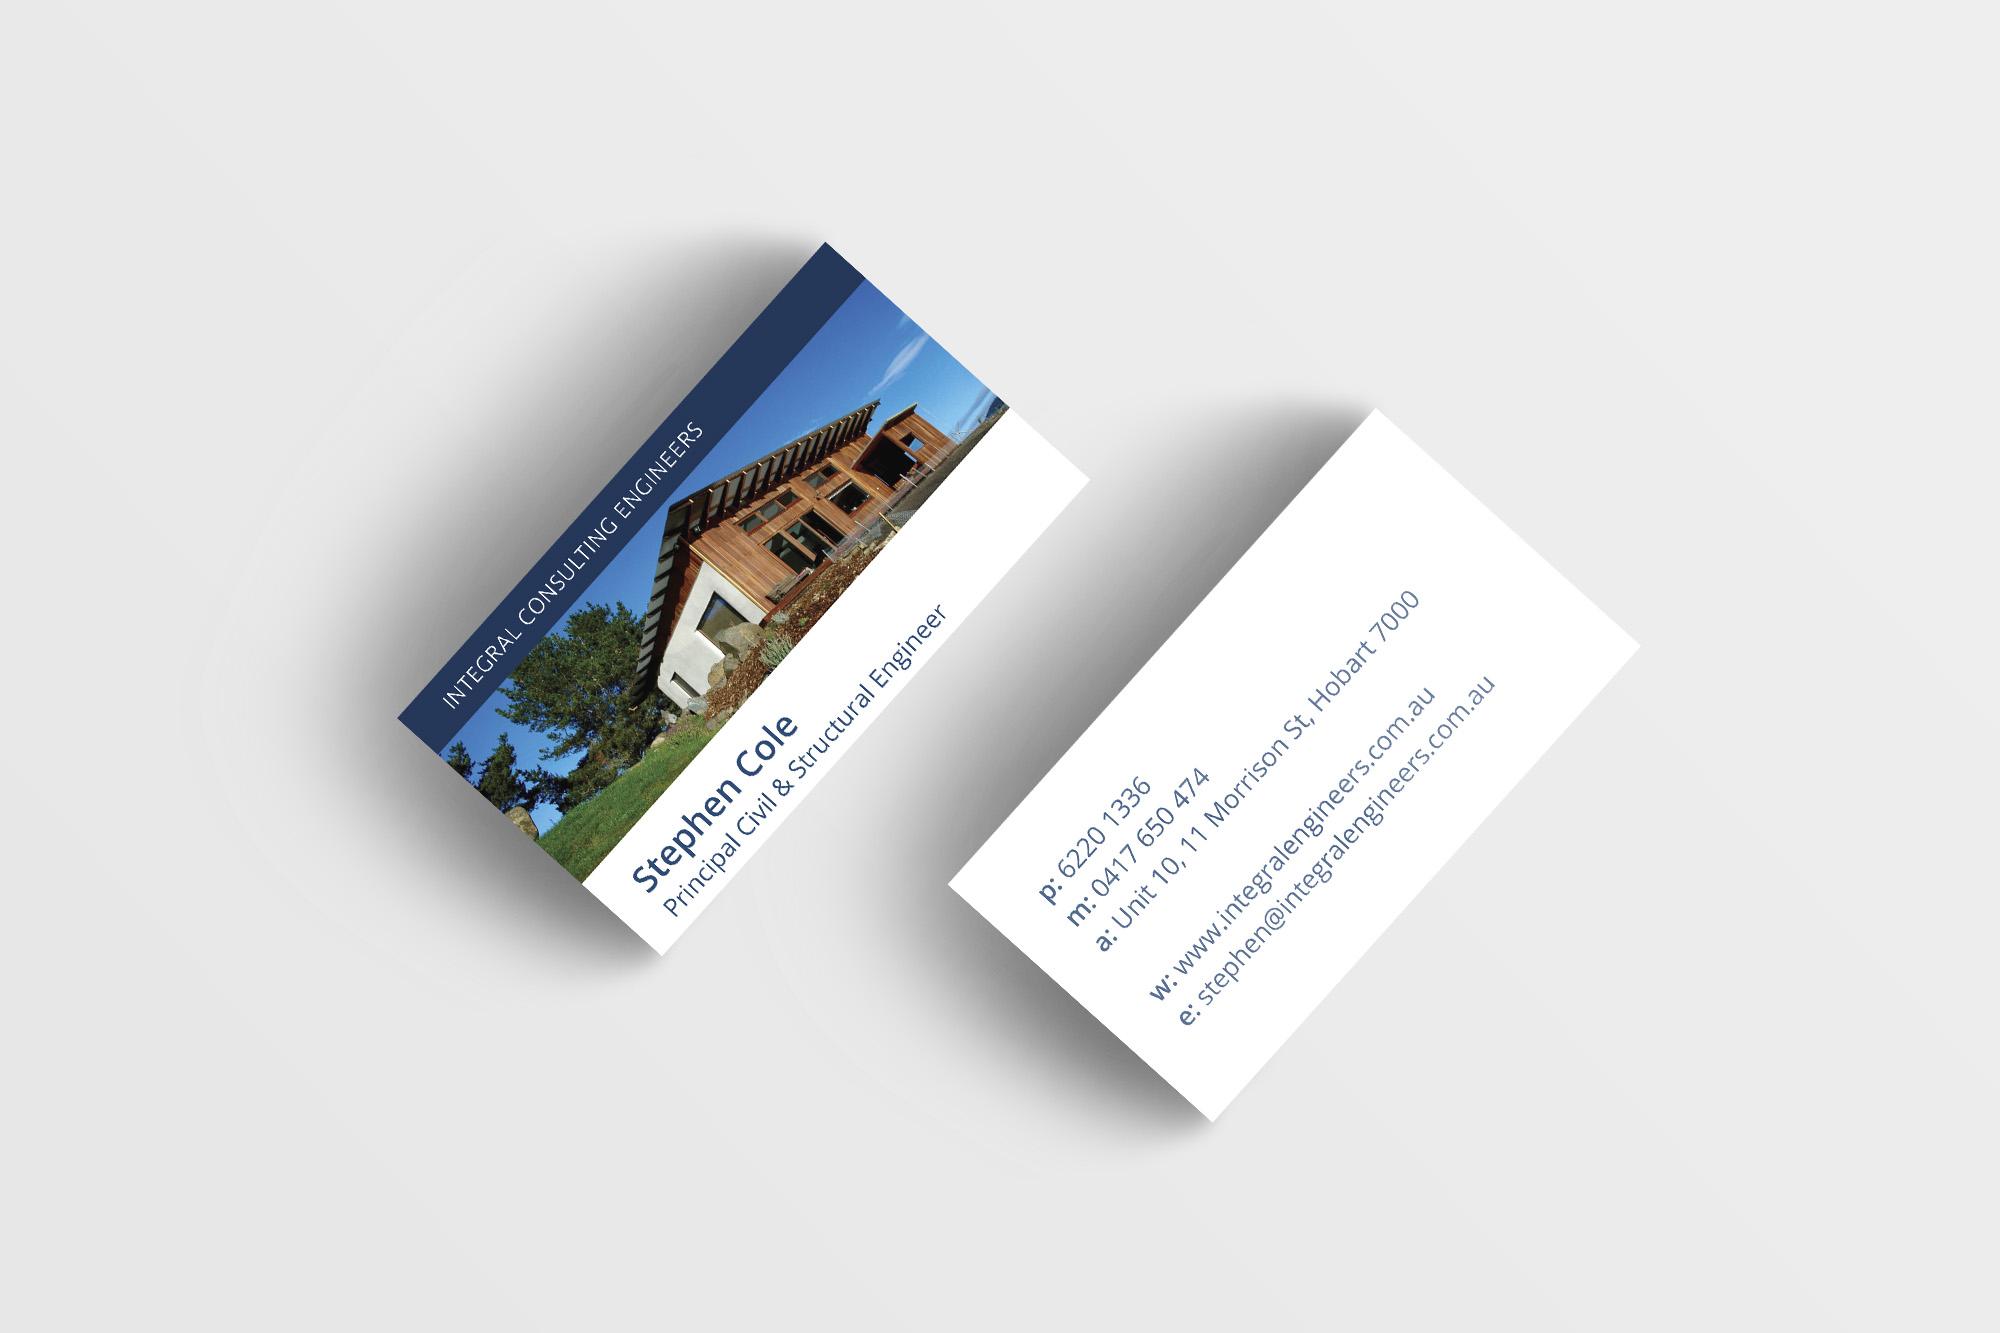 Integral Consulting Business Cards Plush Design Studio Coffs Harbour.jpg